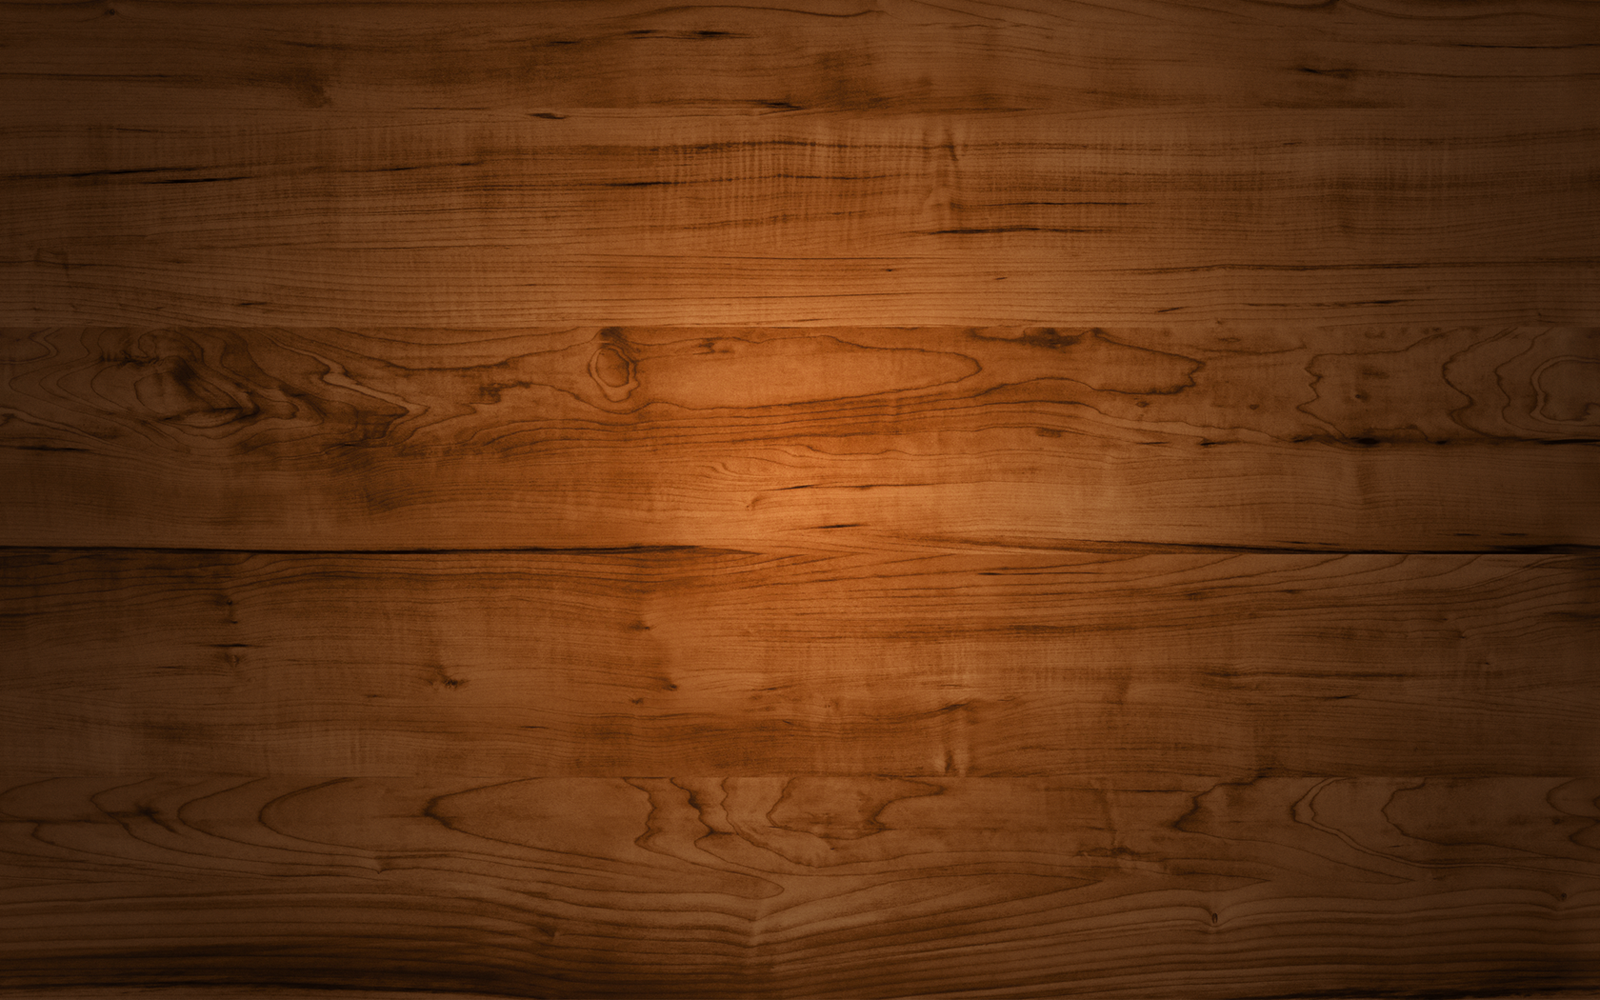 Andro Heeney Wood Brown Background HD Wallpaper 08052014 1600x1000